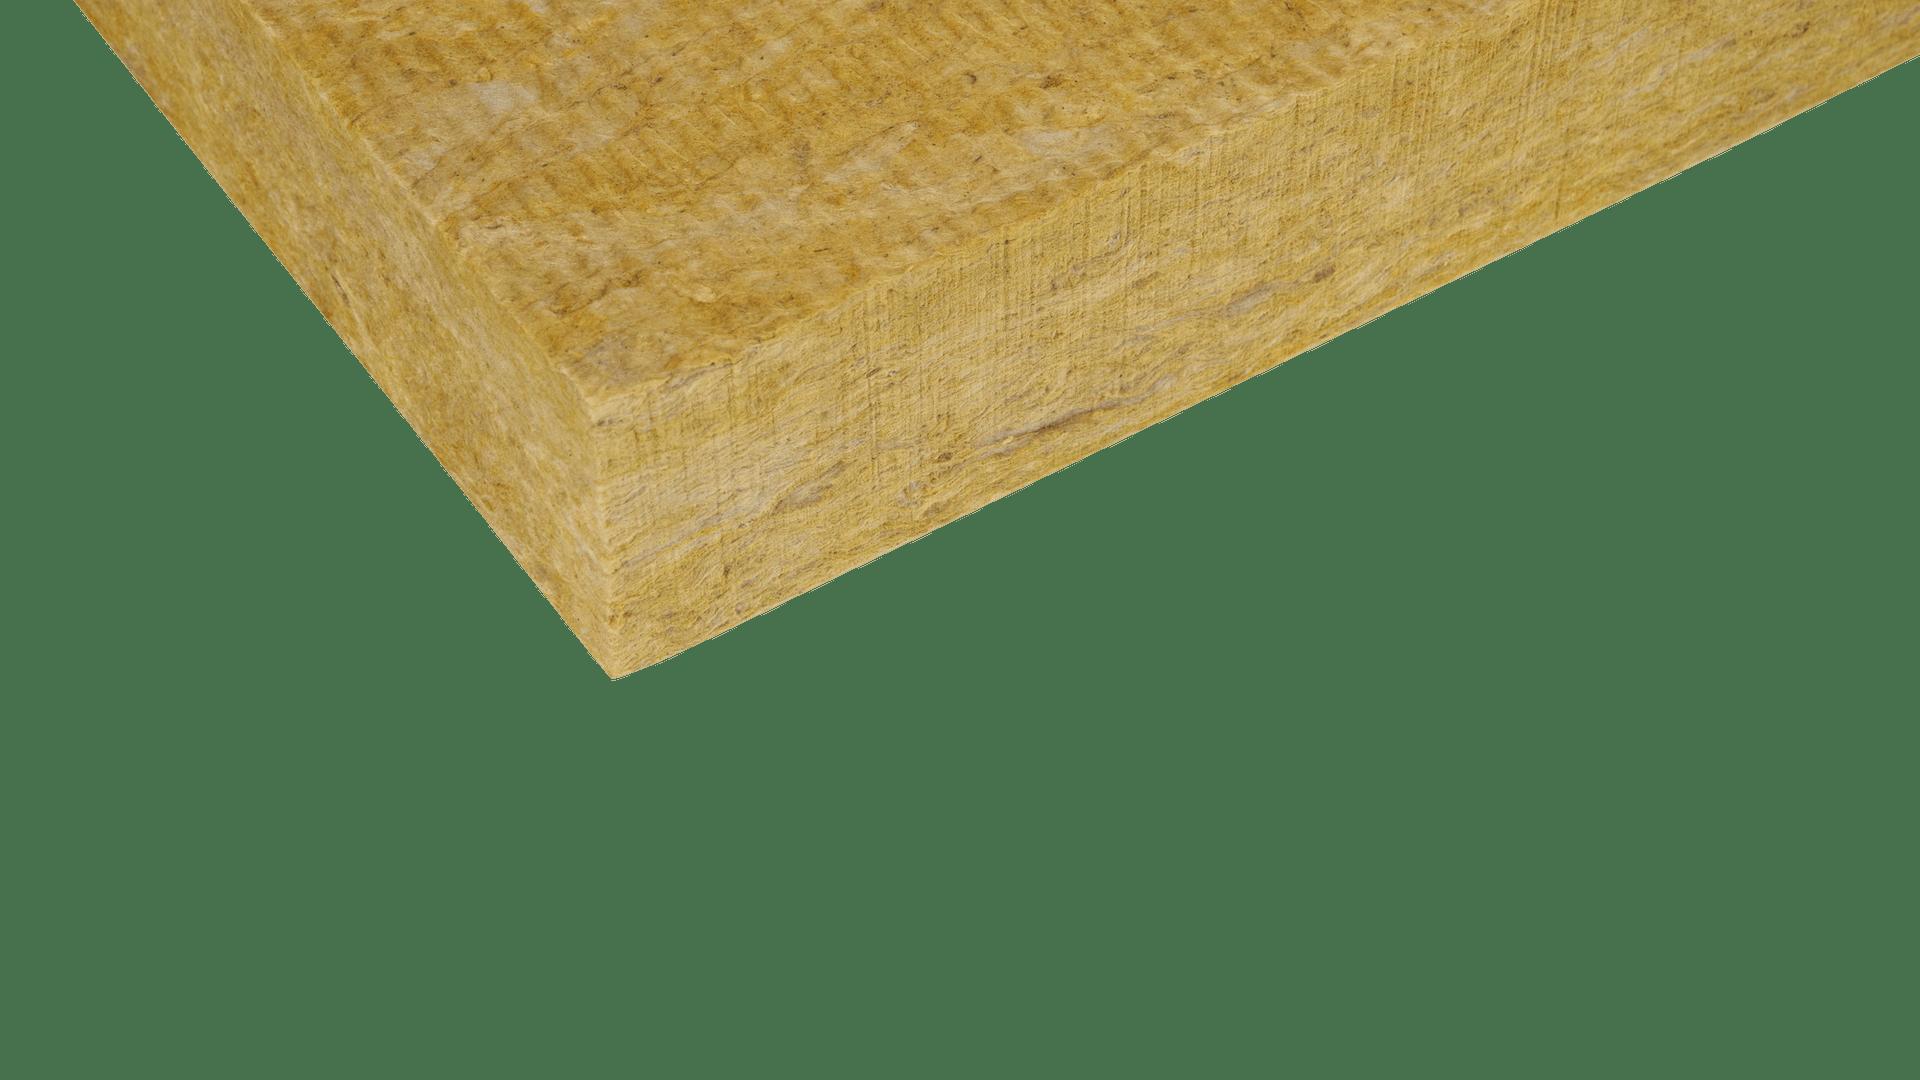 Product pictures, Underlag Energy, Underlay Roof Slab 60/40/36, URS 60/40/36